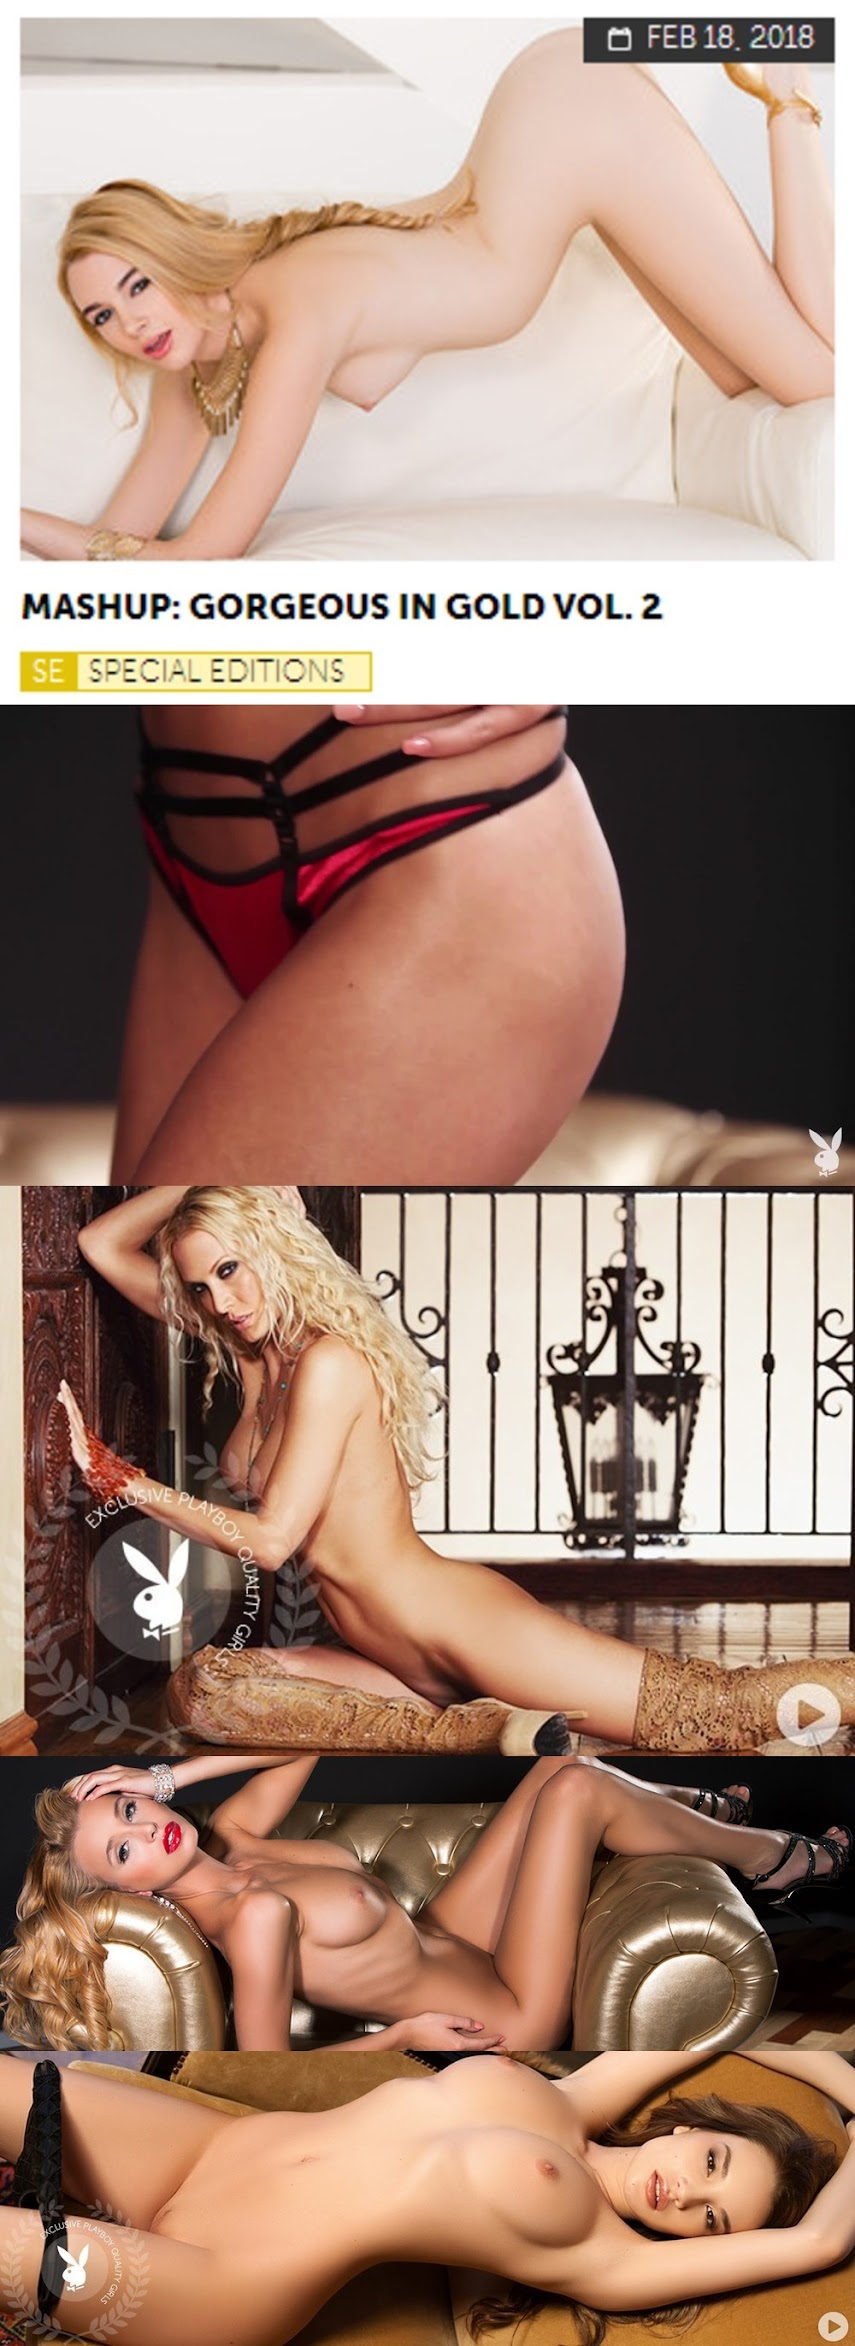 Playboy PlayboyPlus2018-02-18 Mashup Gorgeous in Gold Vol. 2 - Girlsdelta